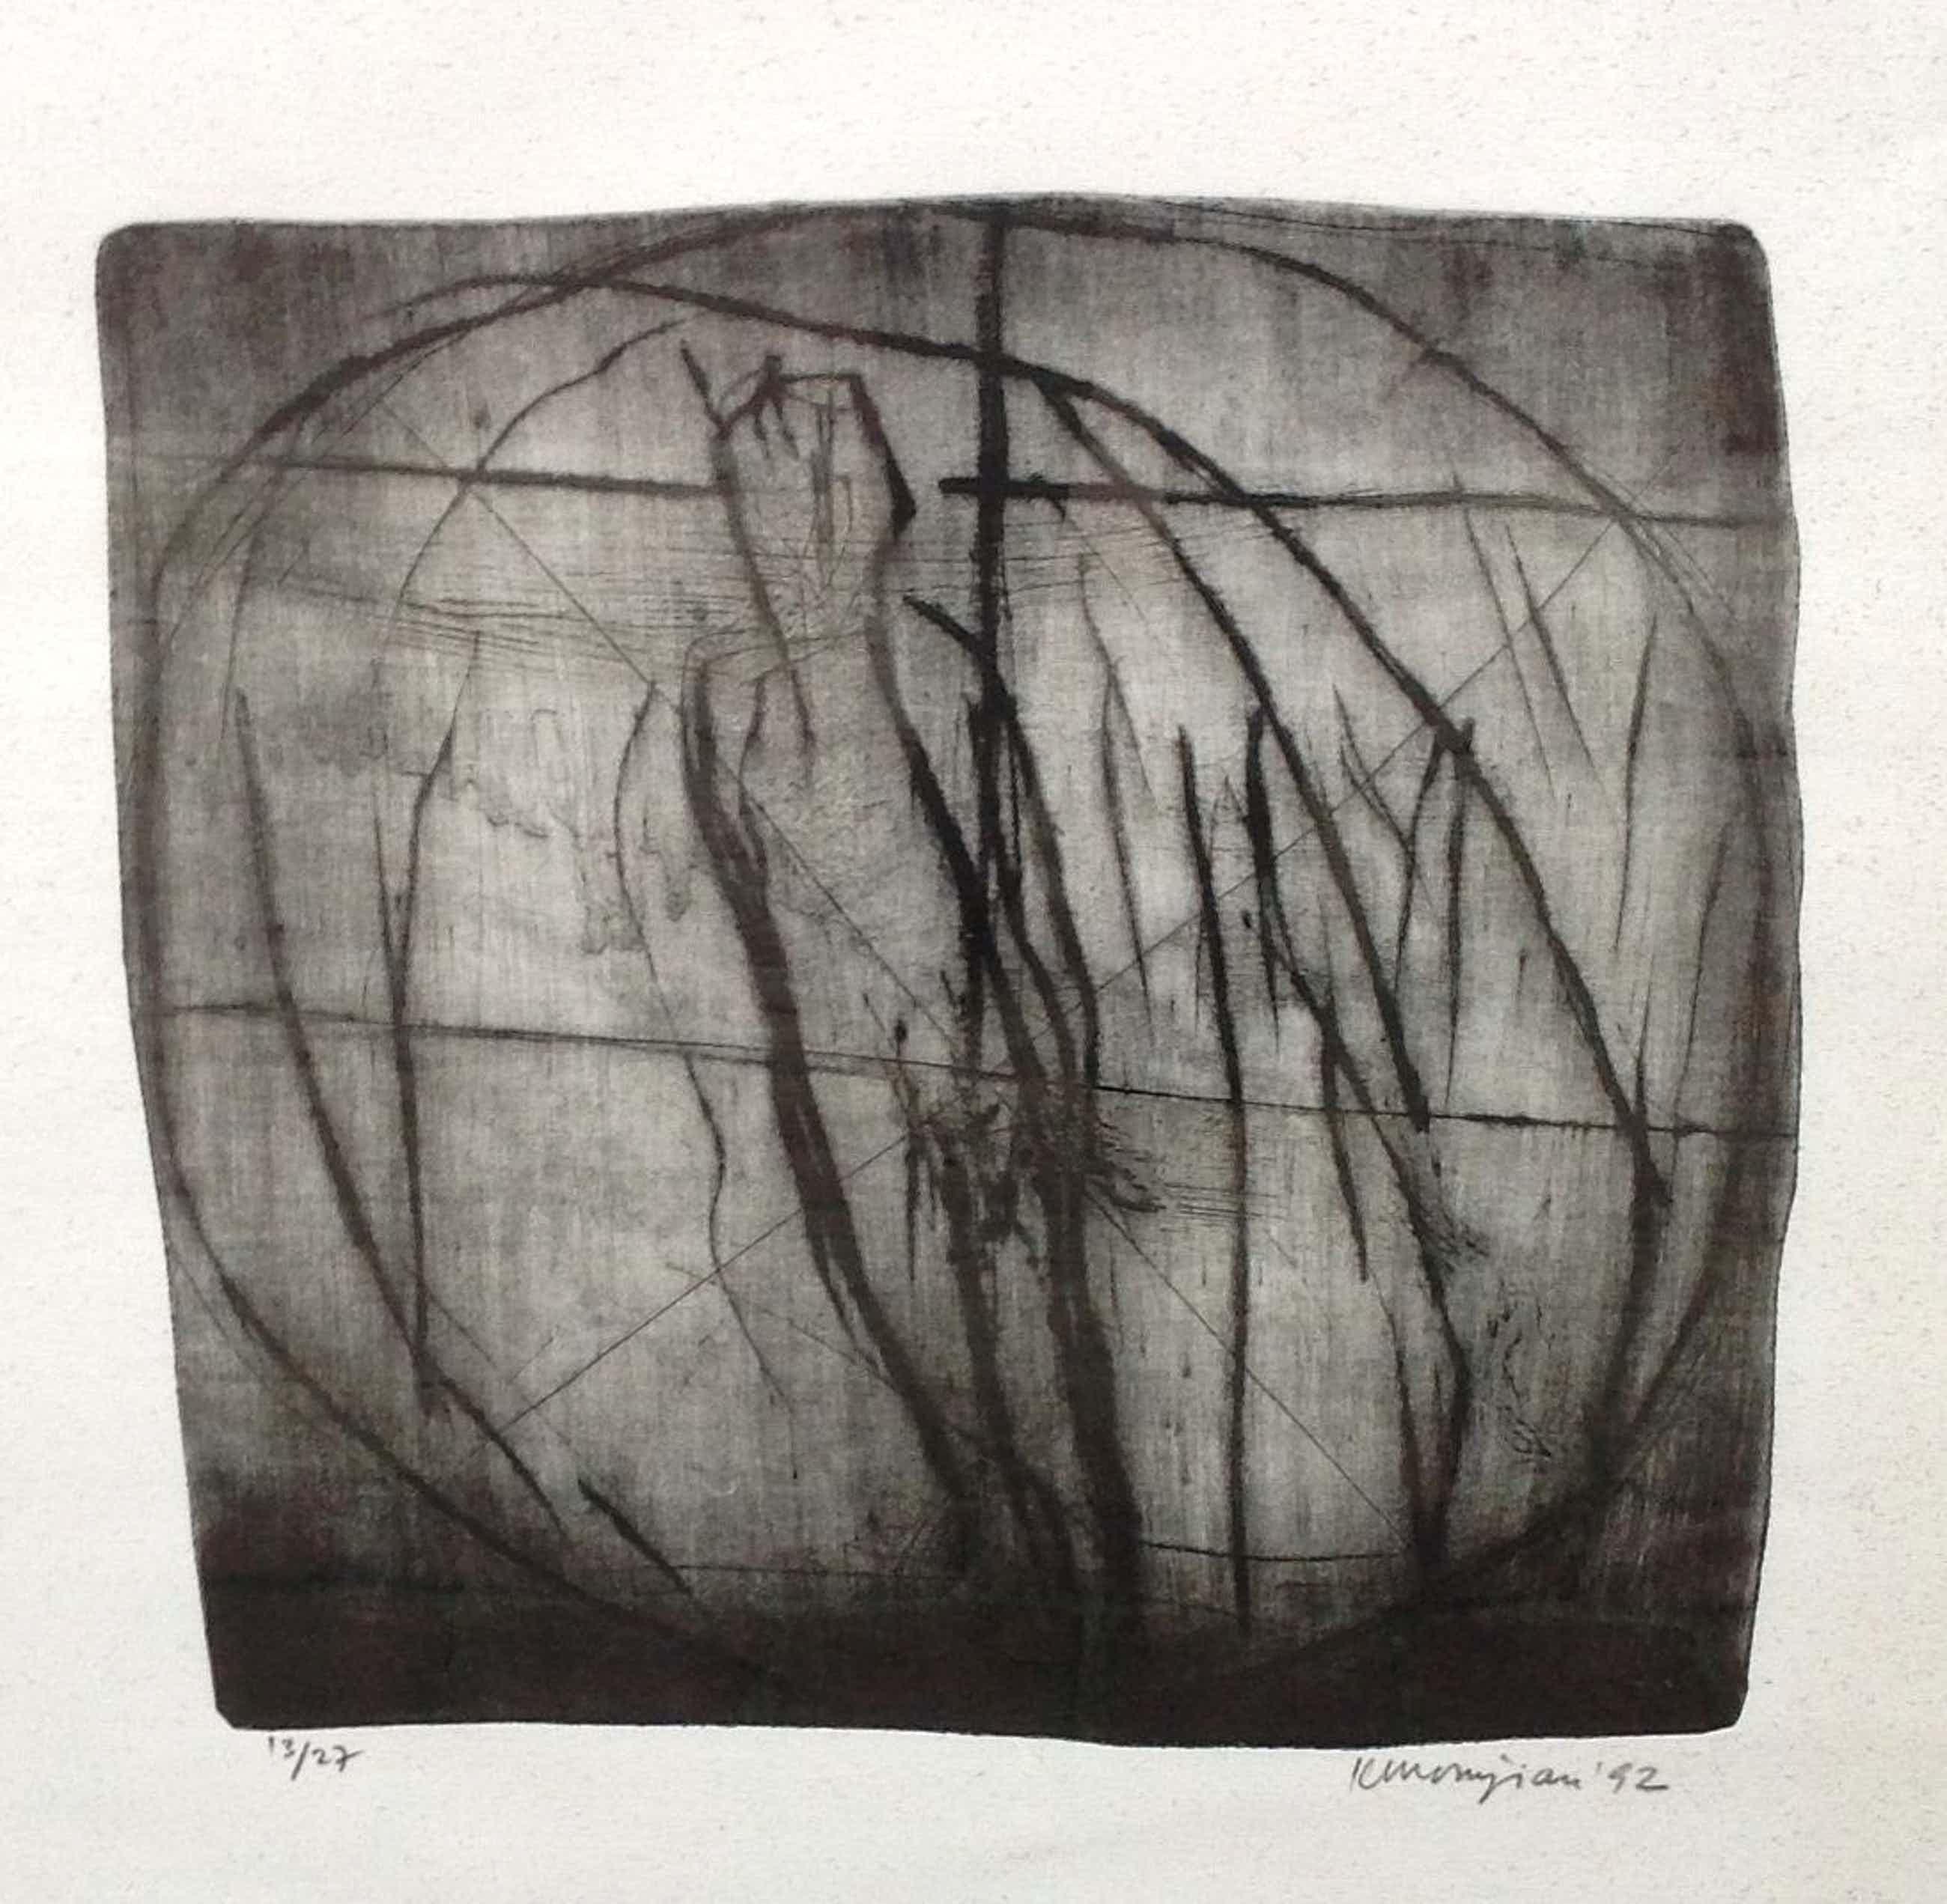 Krikor Momdjian - C211-1 - Abstracte voorstelling kopen? Bied vanaf 50!